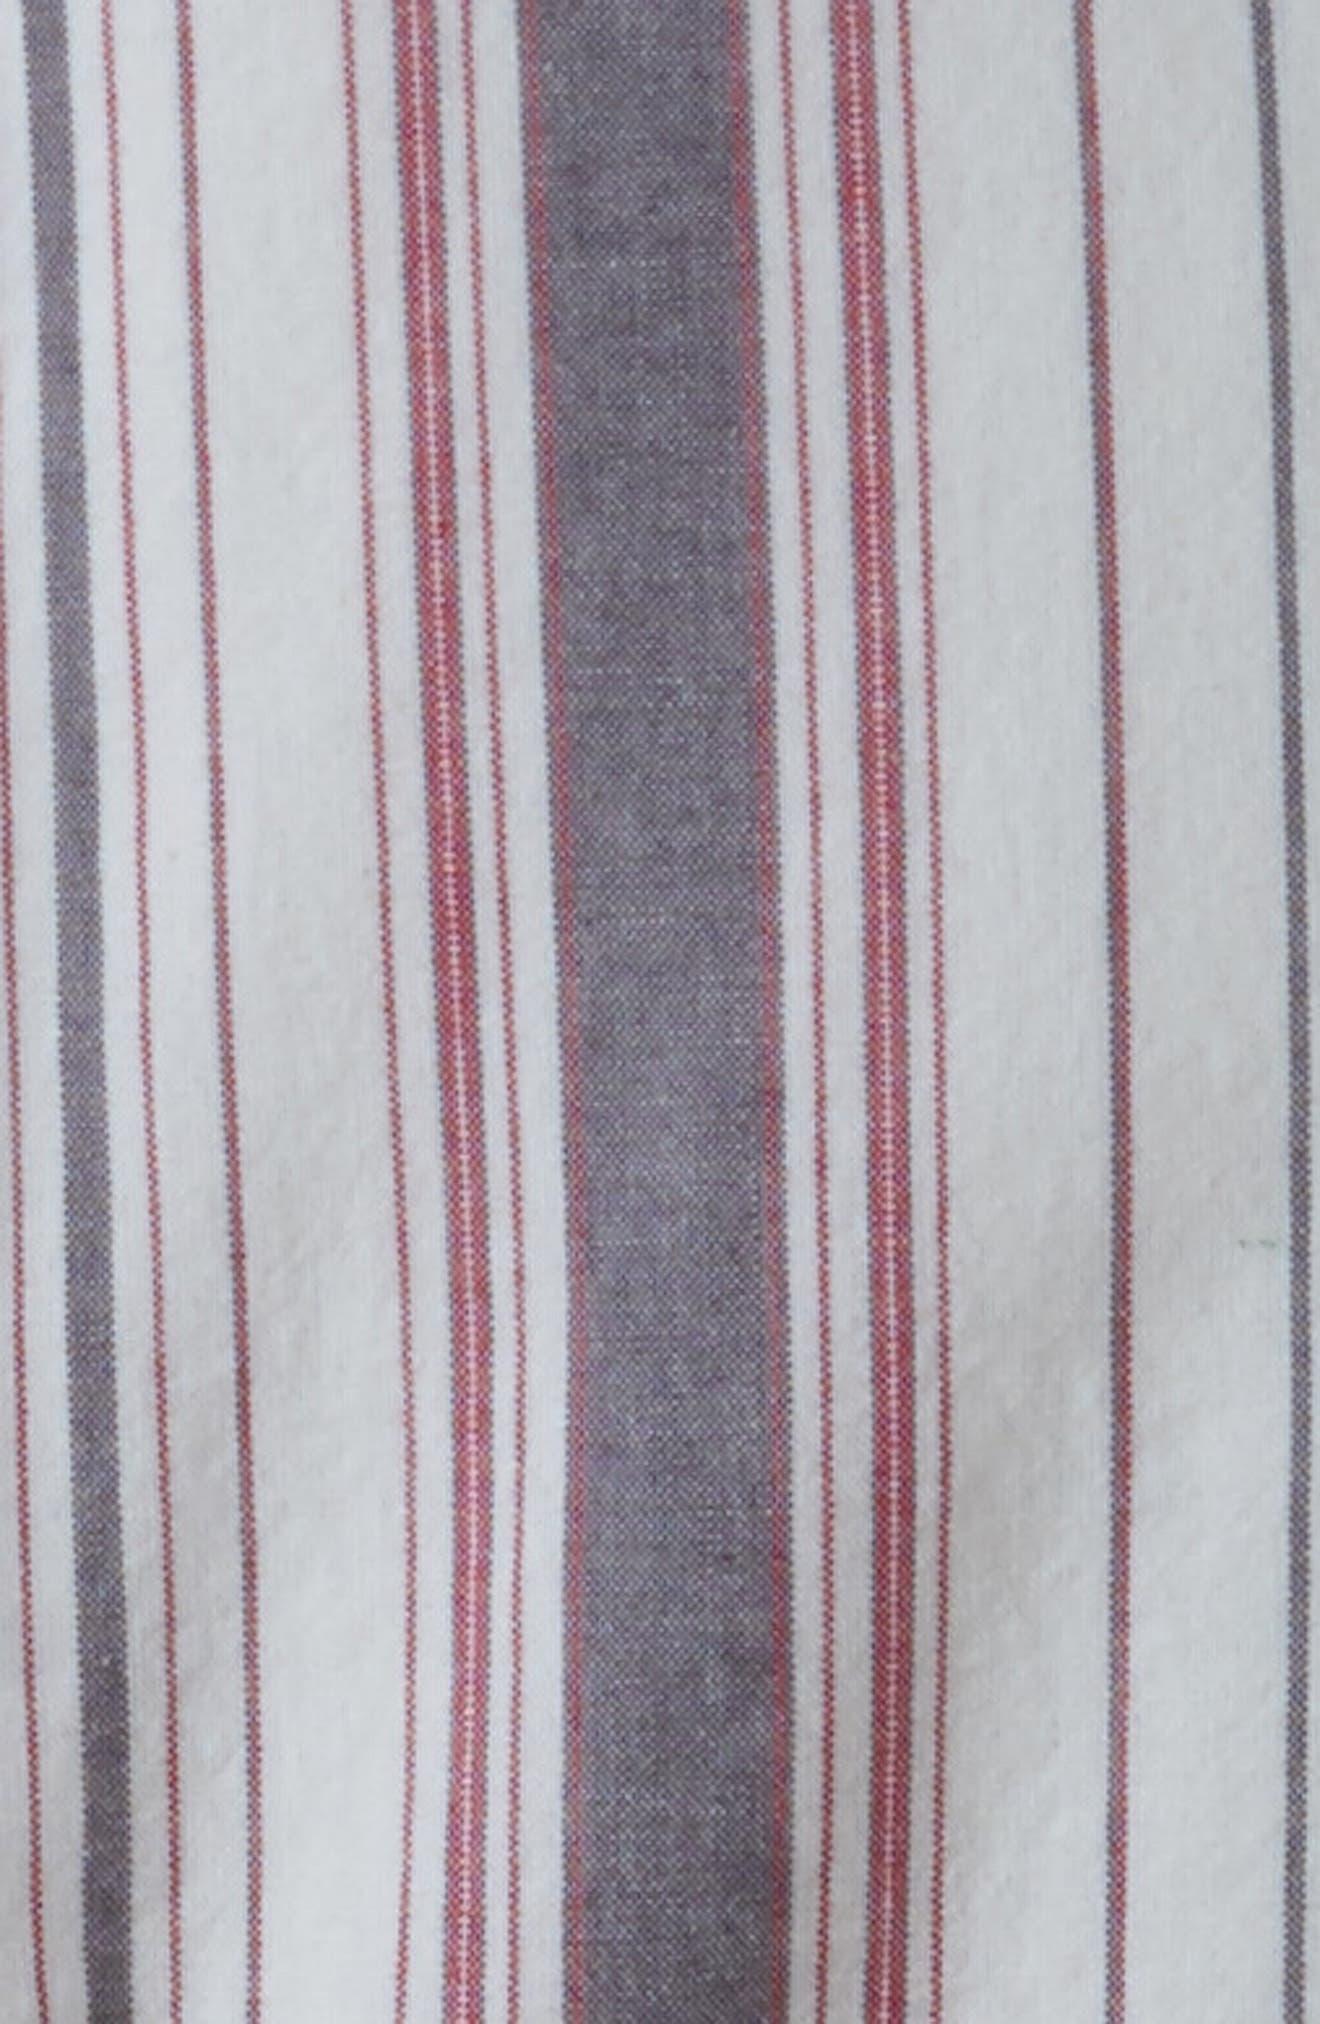 Mixed Stripe Duvet Cover,                             Alternate thumbnail 2, color,                             900